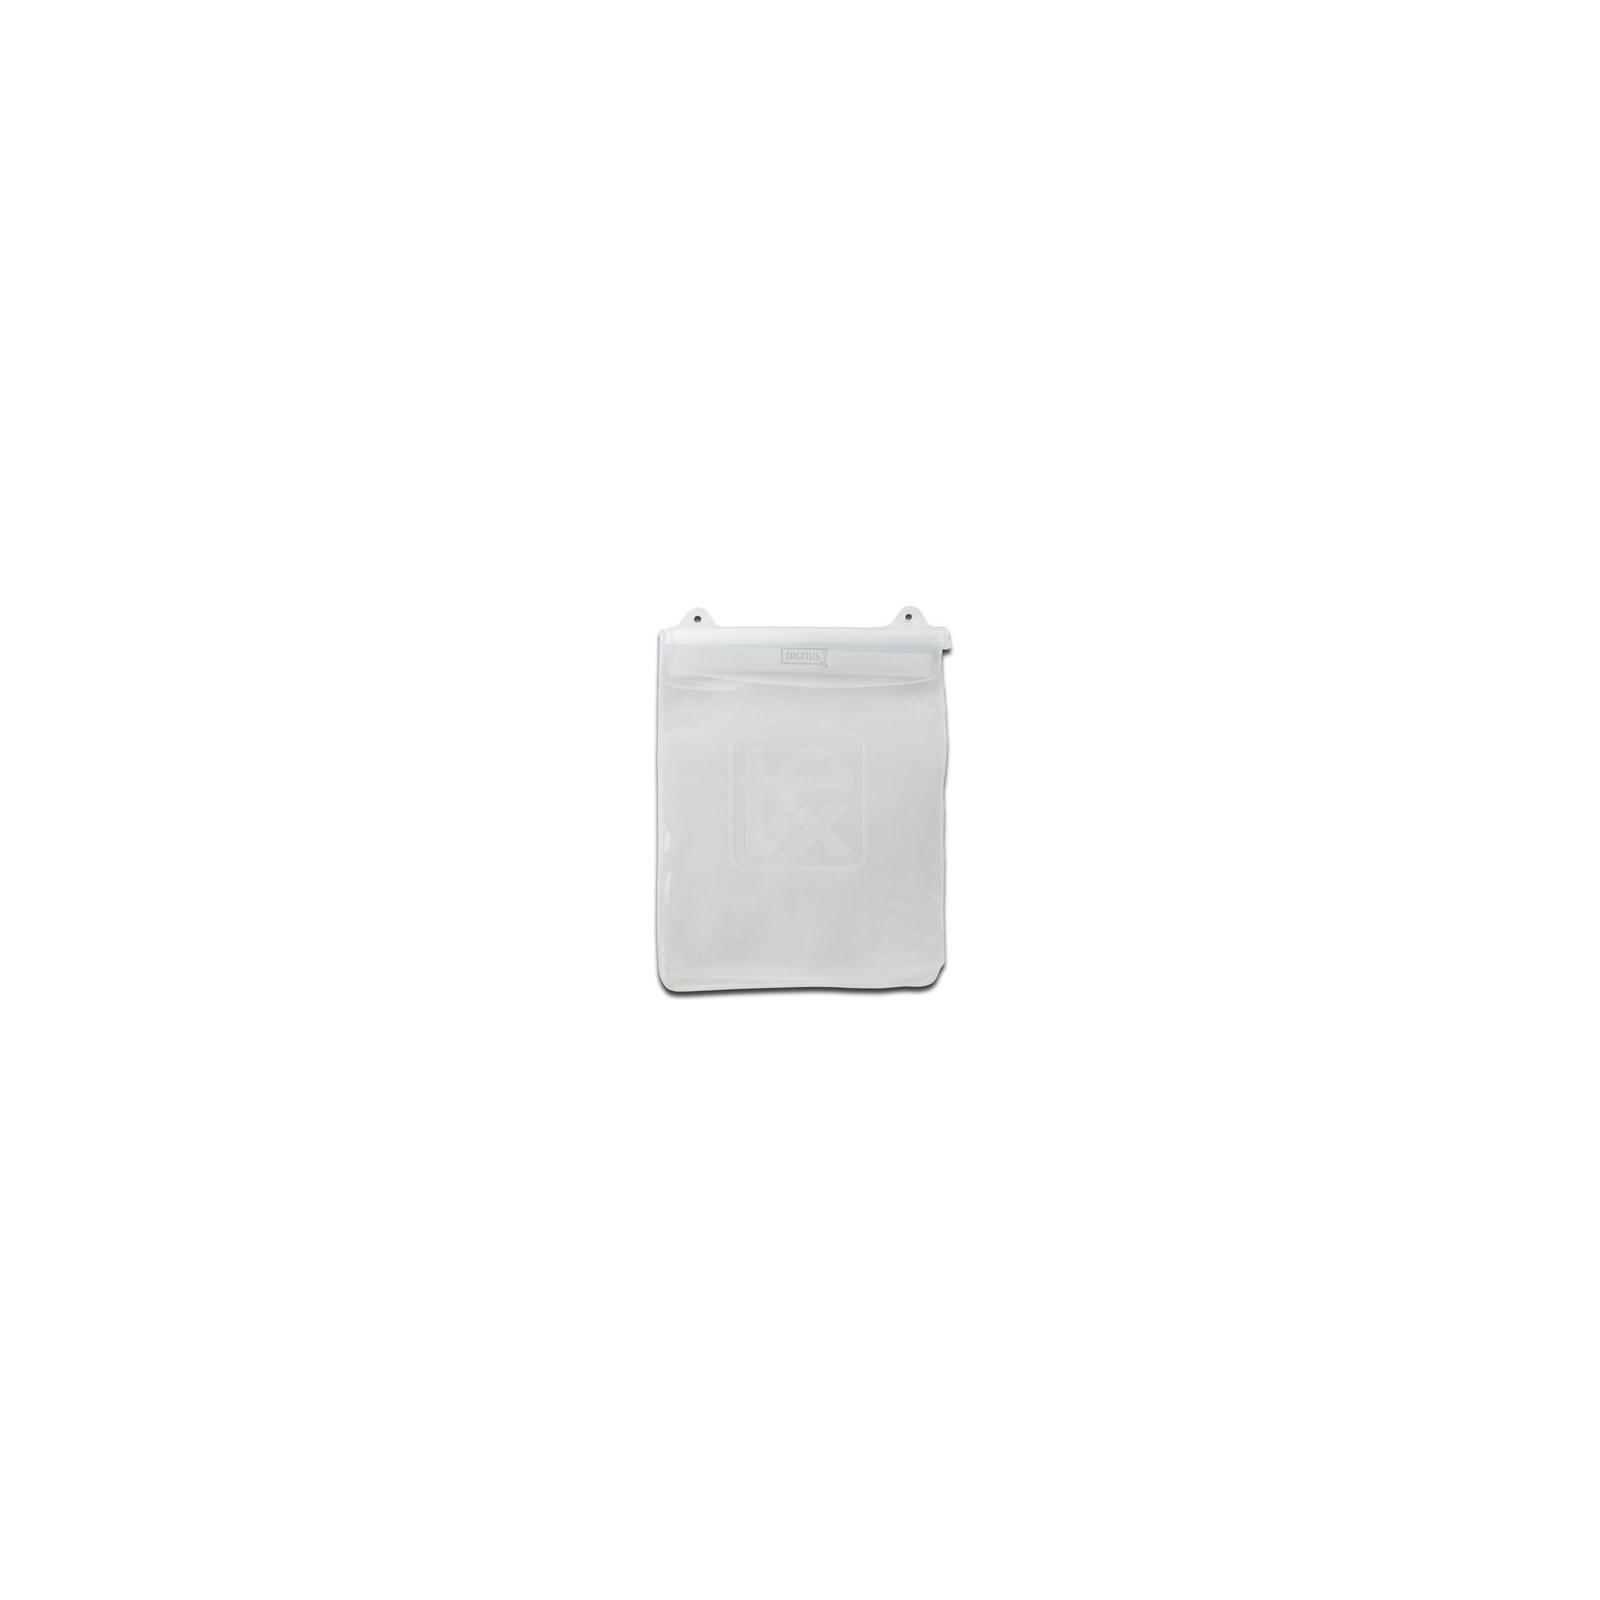 Чехол для планшета DIGITUS Universal Protectable Suit (DA-22000)